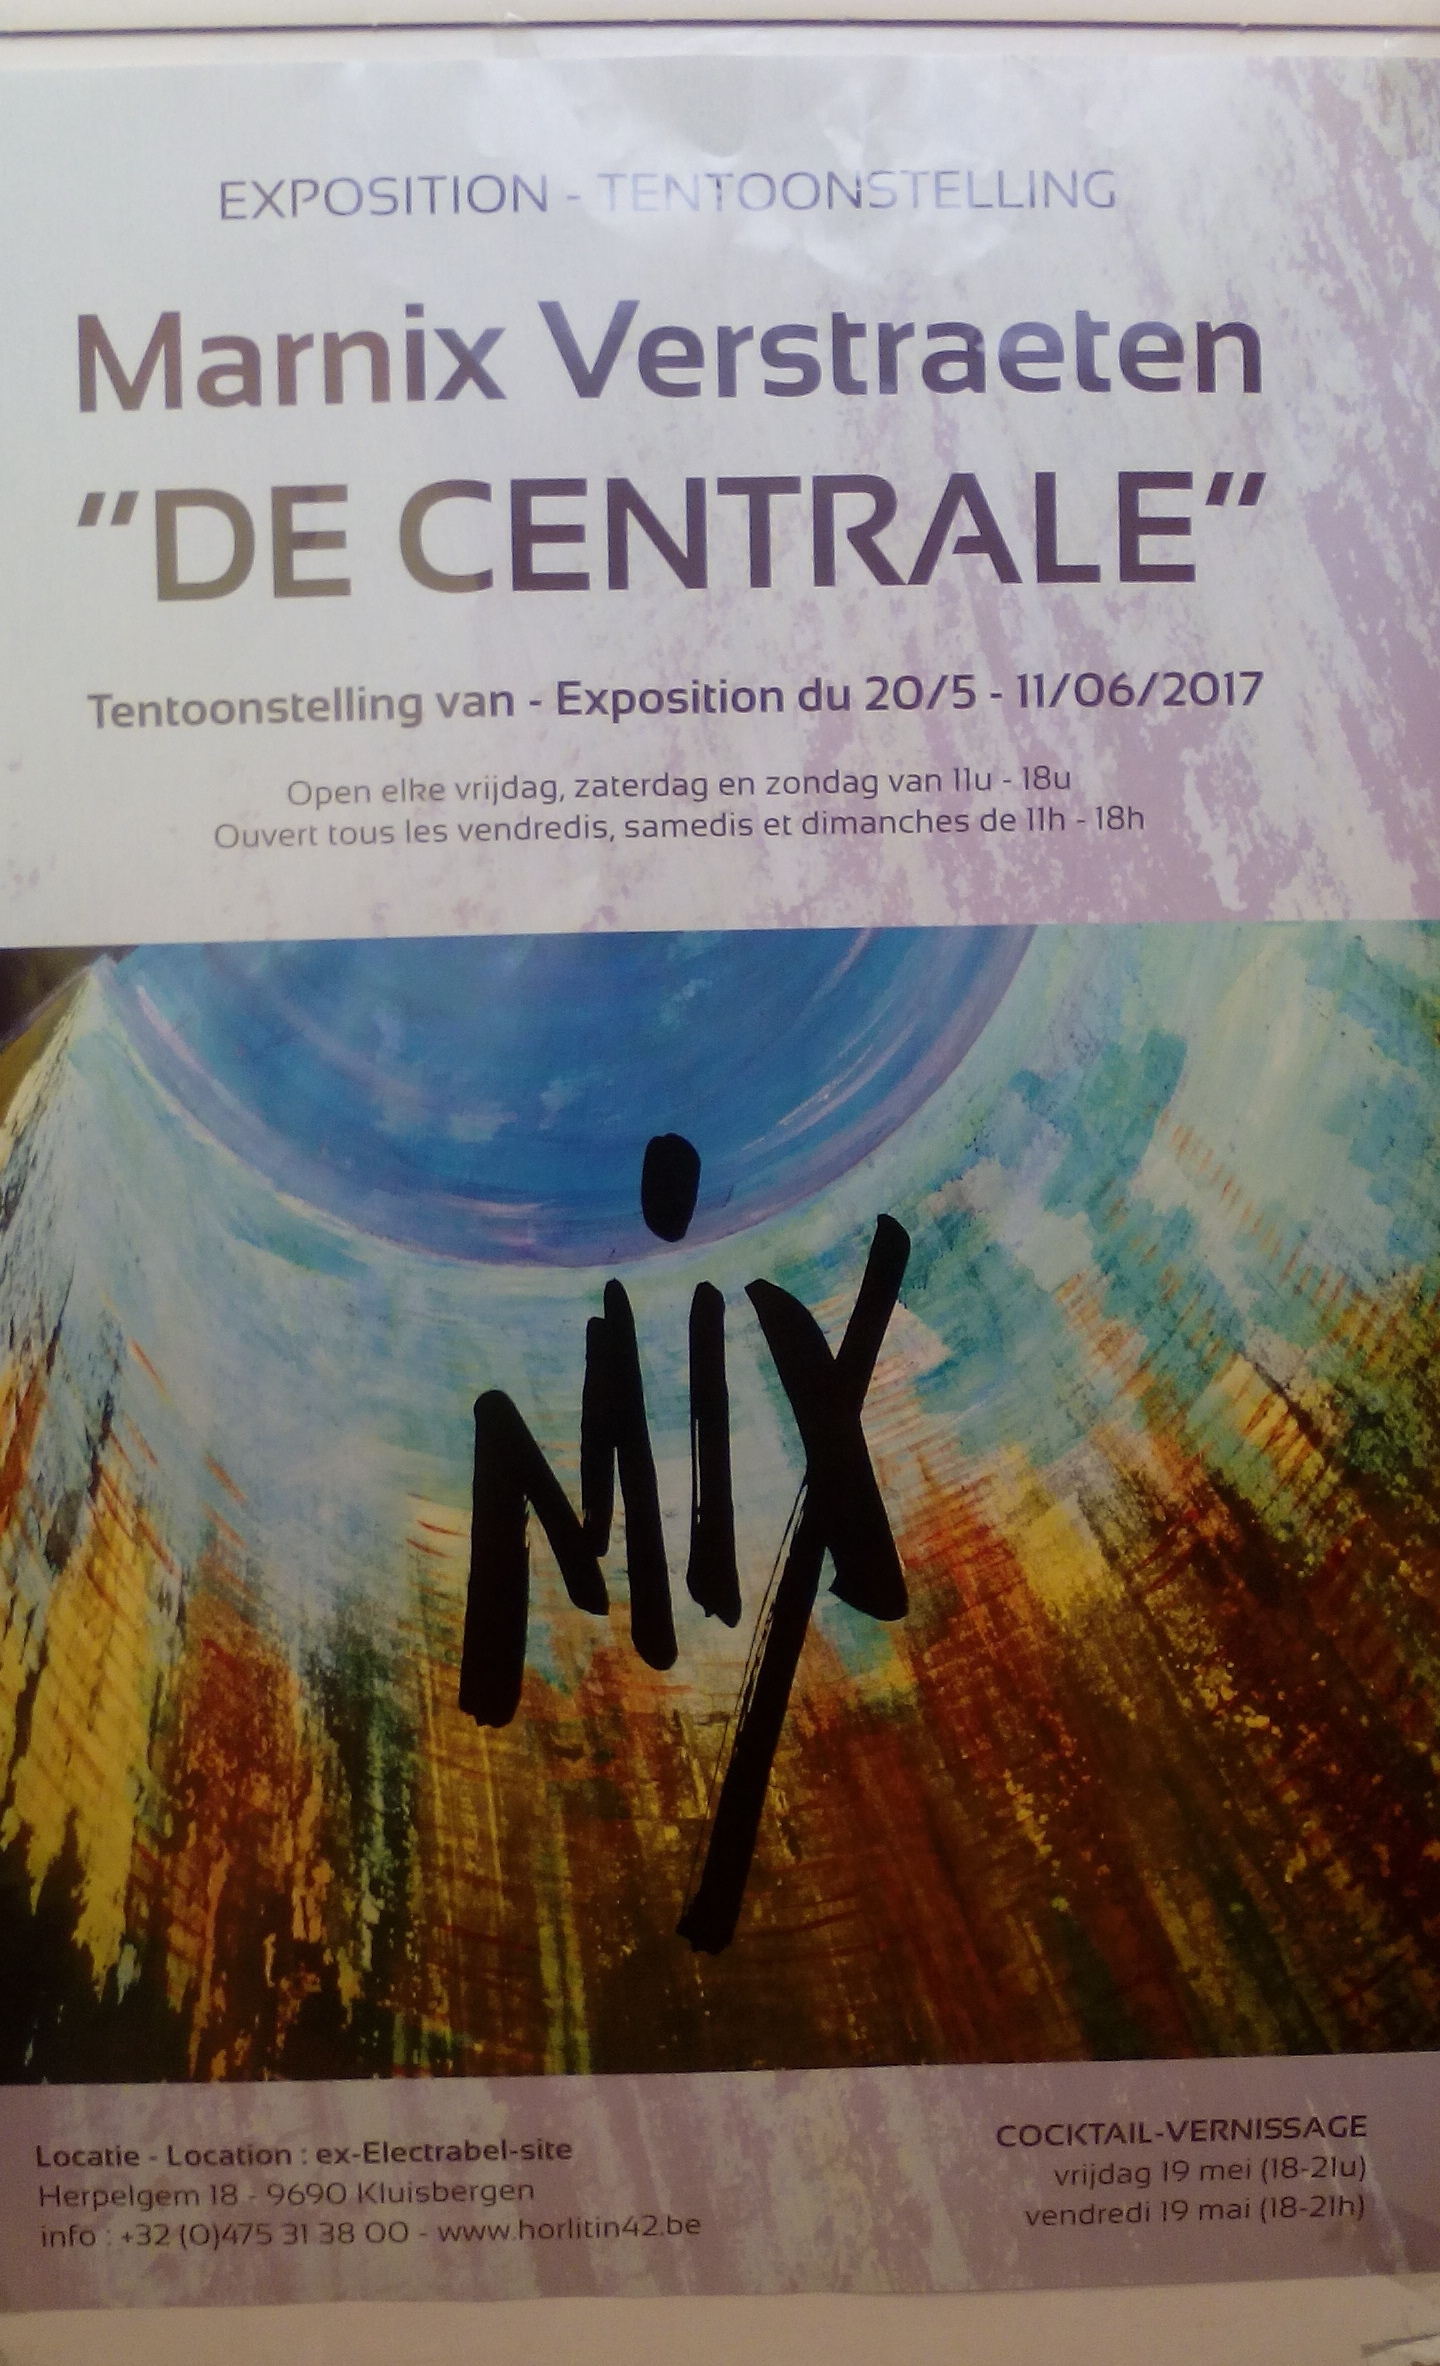 Marnix Verstraeten - tentoonstelling 'DE CENTRALE'